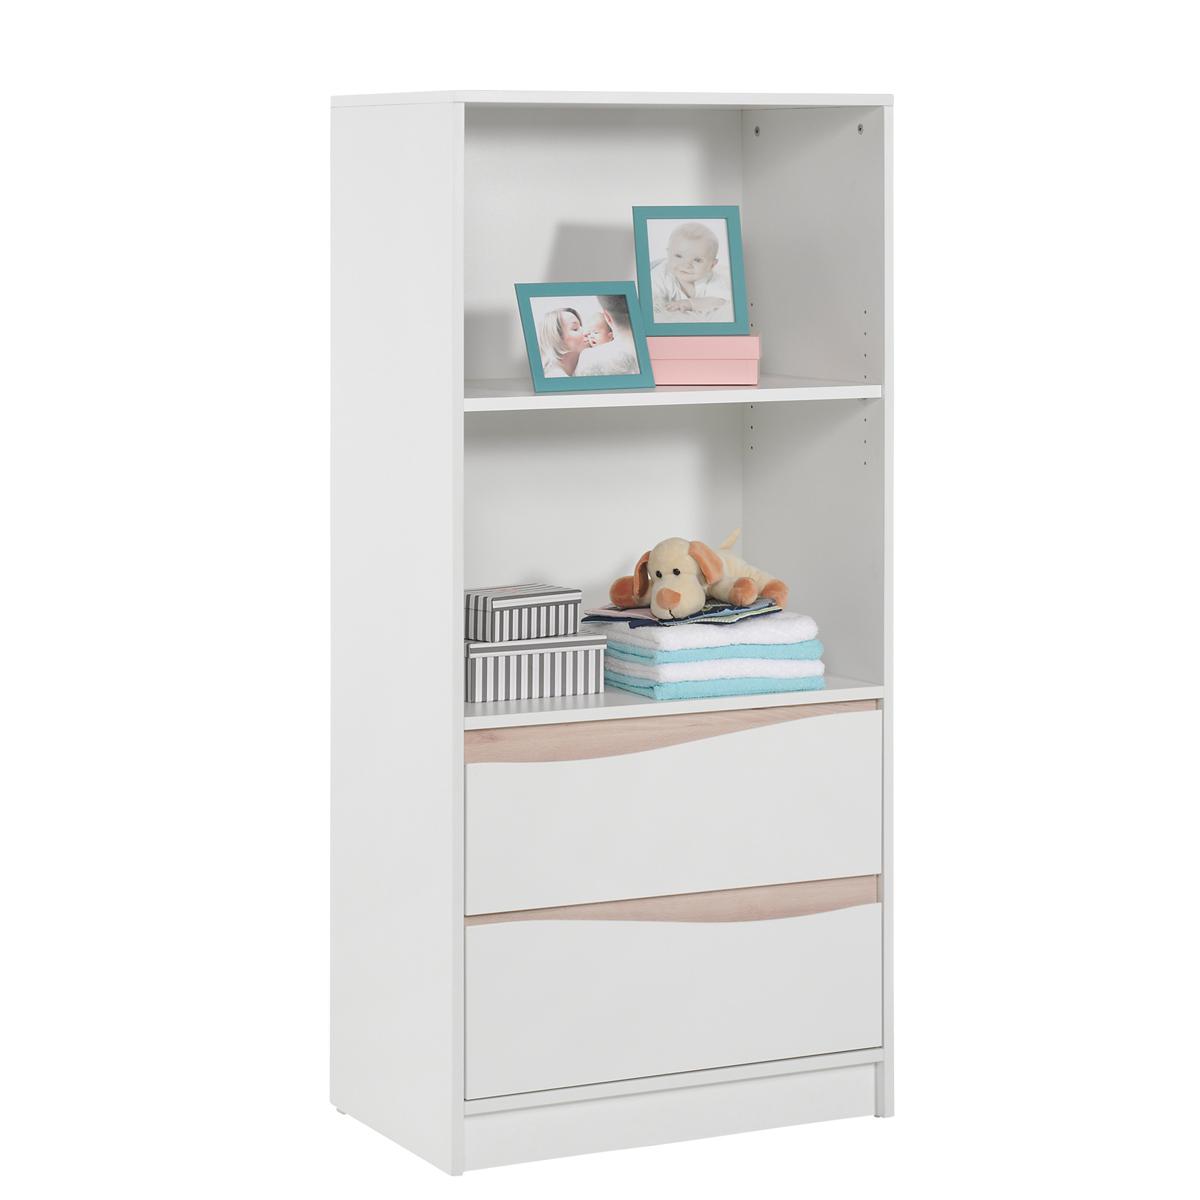 geuther chambre trio lit commode etag re haute collection wave blanc naturel chambre. Black Bedroom Furniture Sets. Home Design Ideas